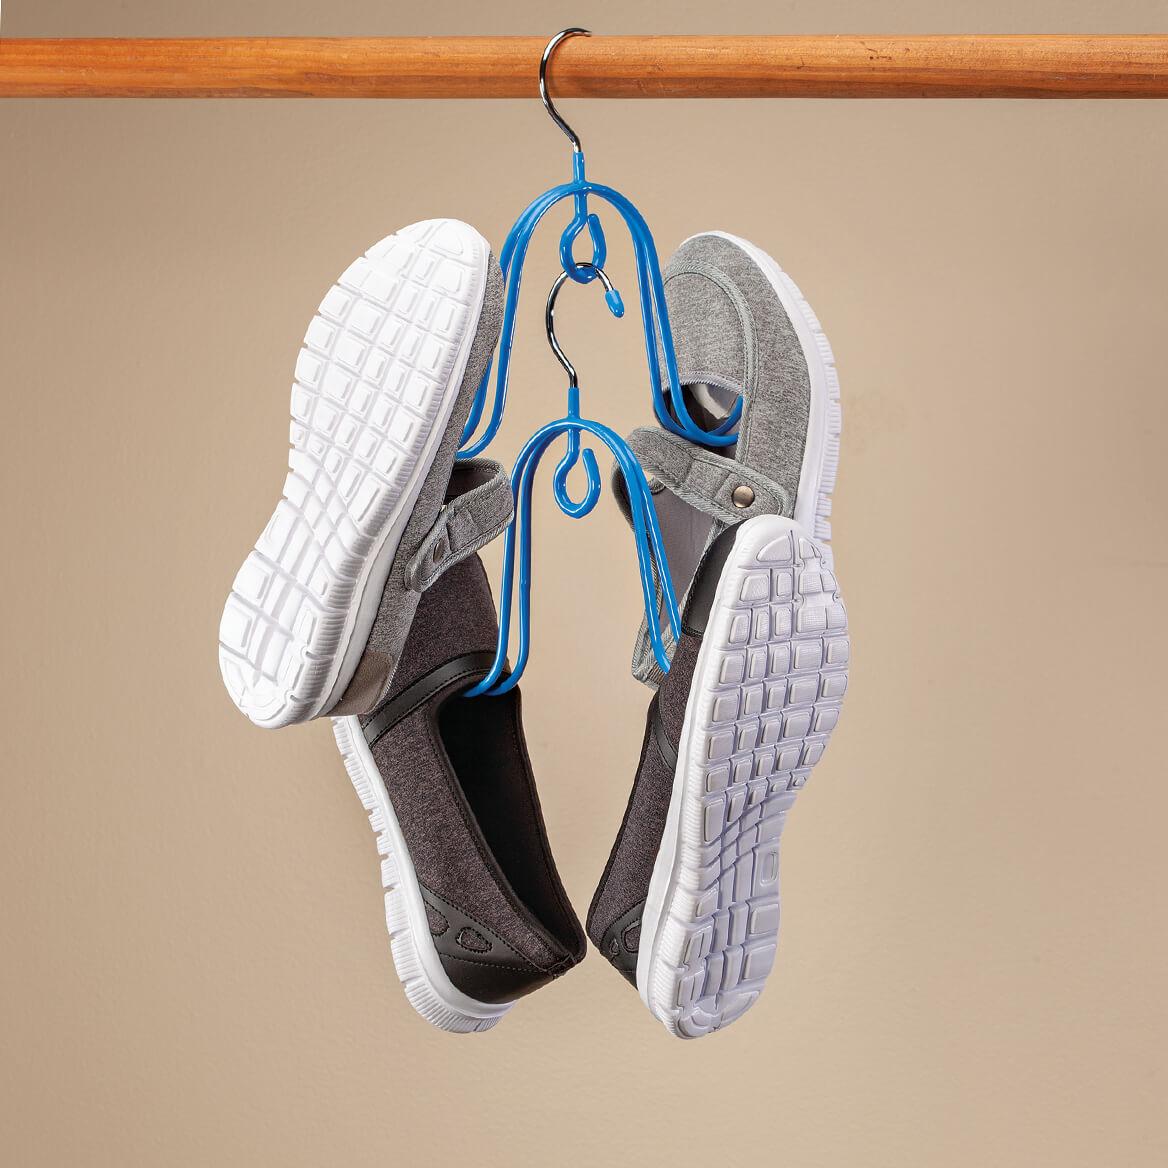 Shoe Hanger and Dryer-371233